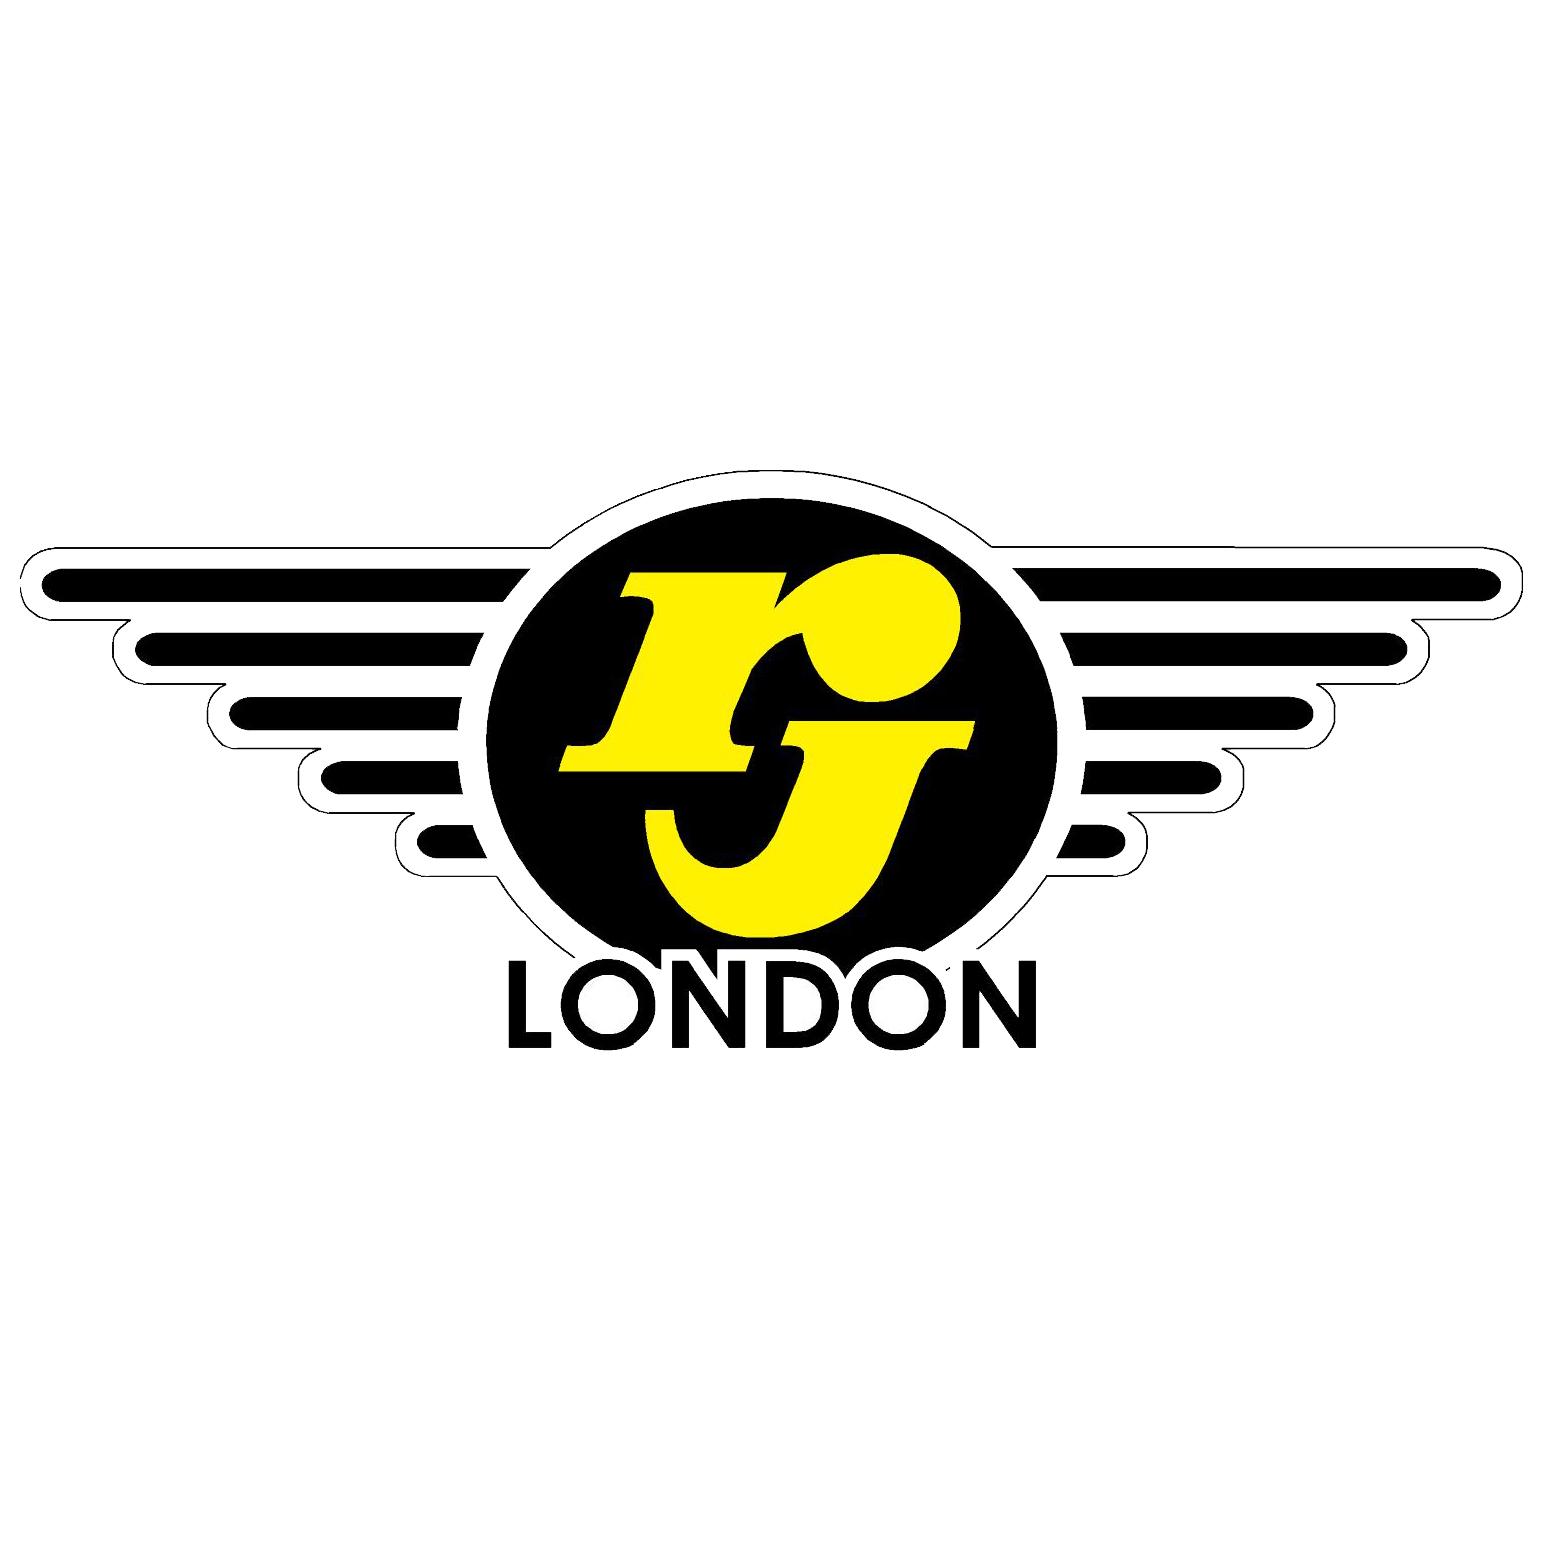 Lowongan Kerja PT Erje London Chemical (RJ) Loker Tangerang